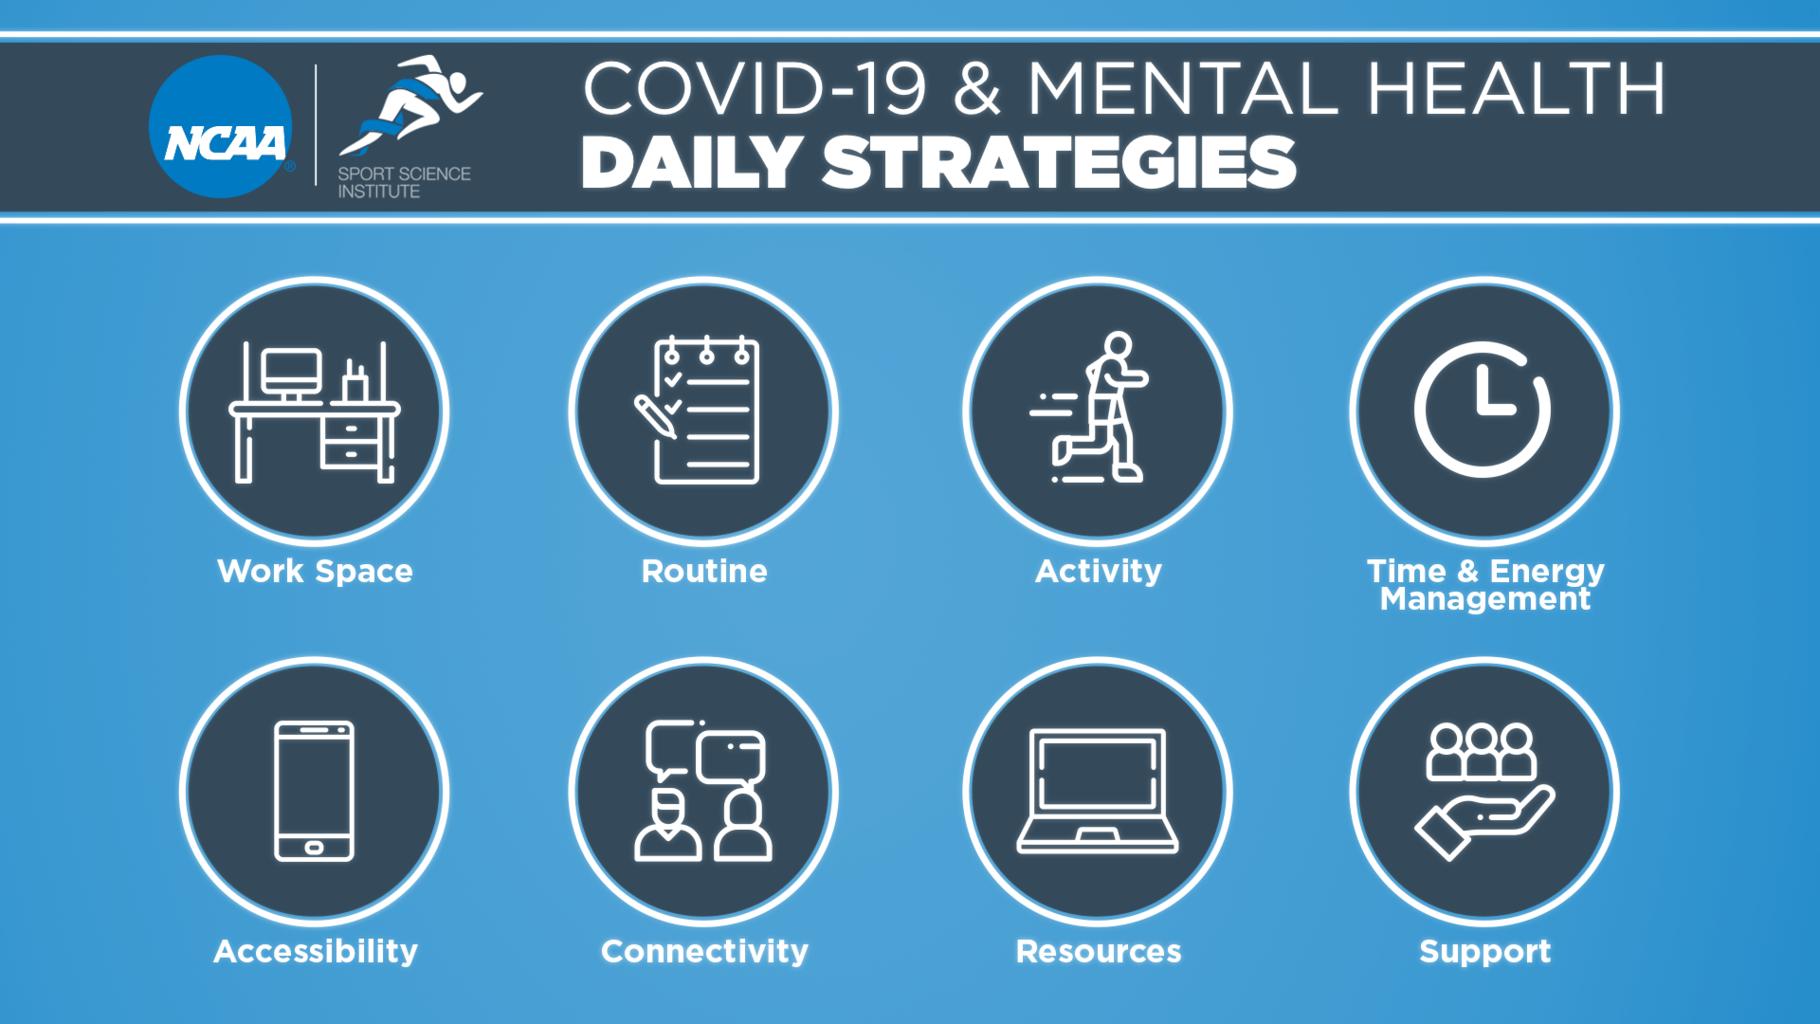 COVID-19 mental health strategies